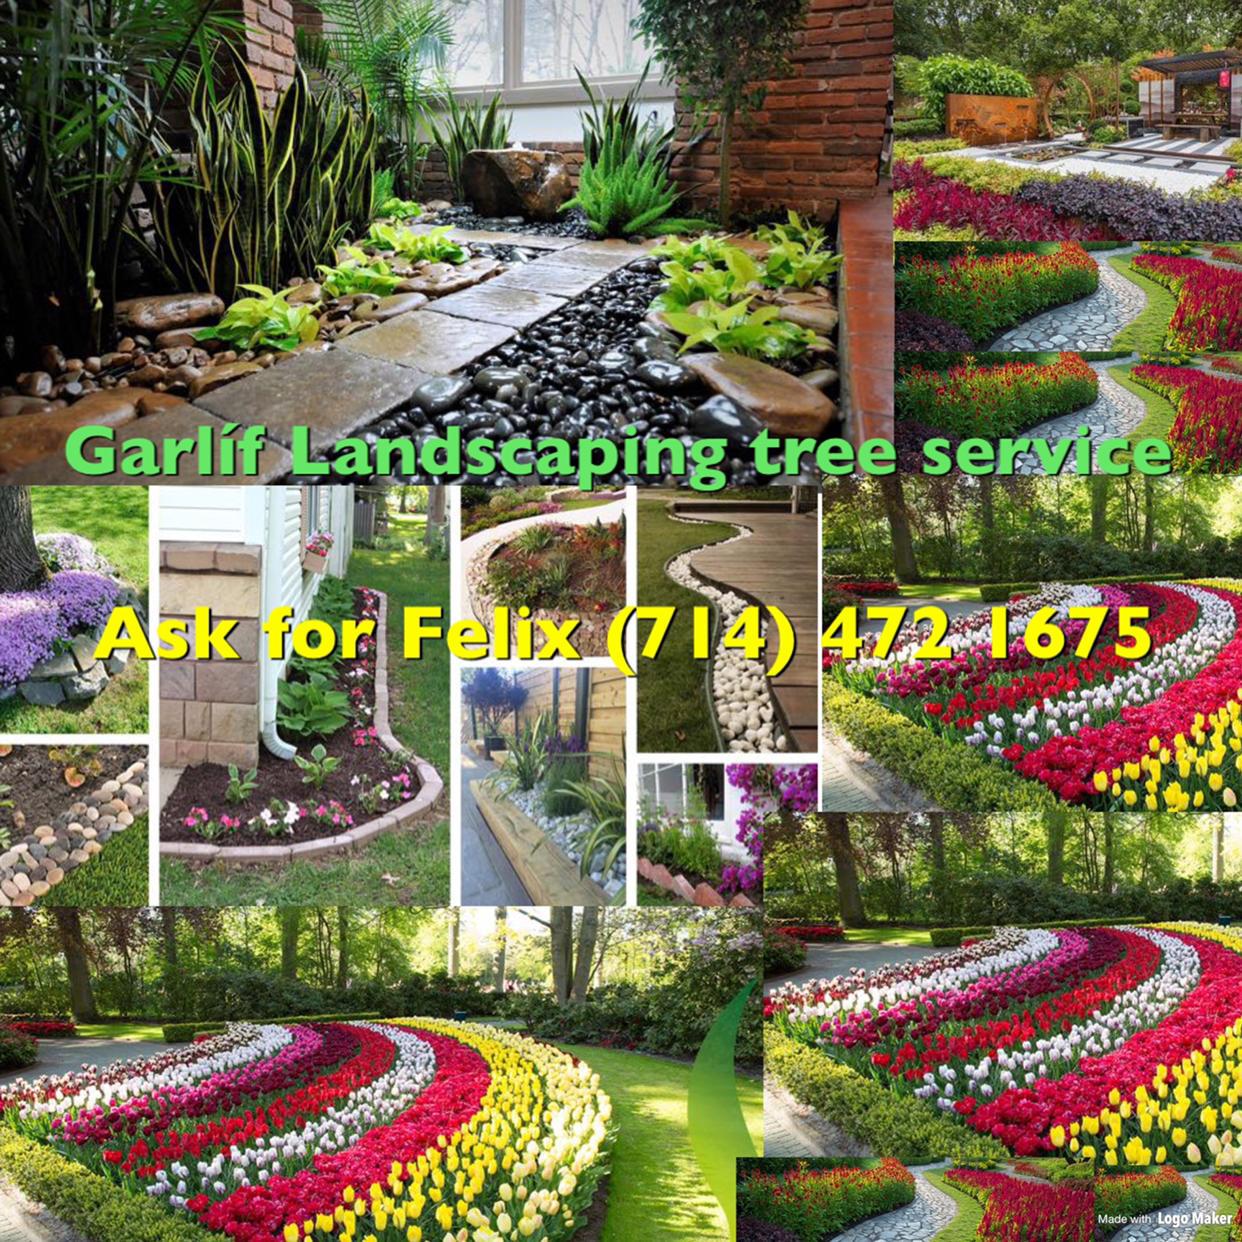 Garlíf Landscaping and Tree service